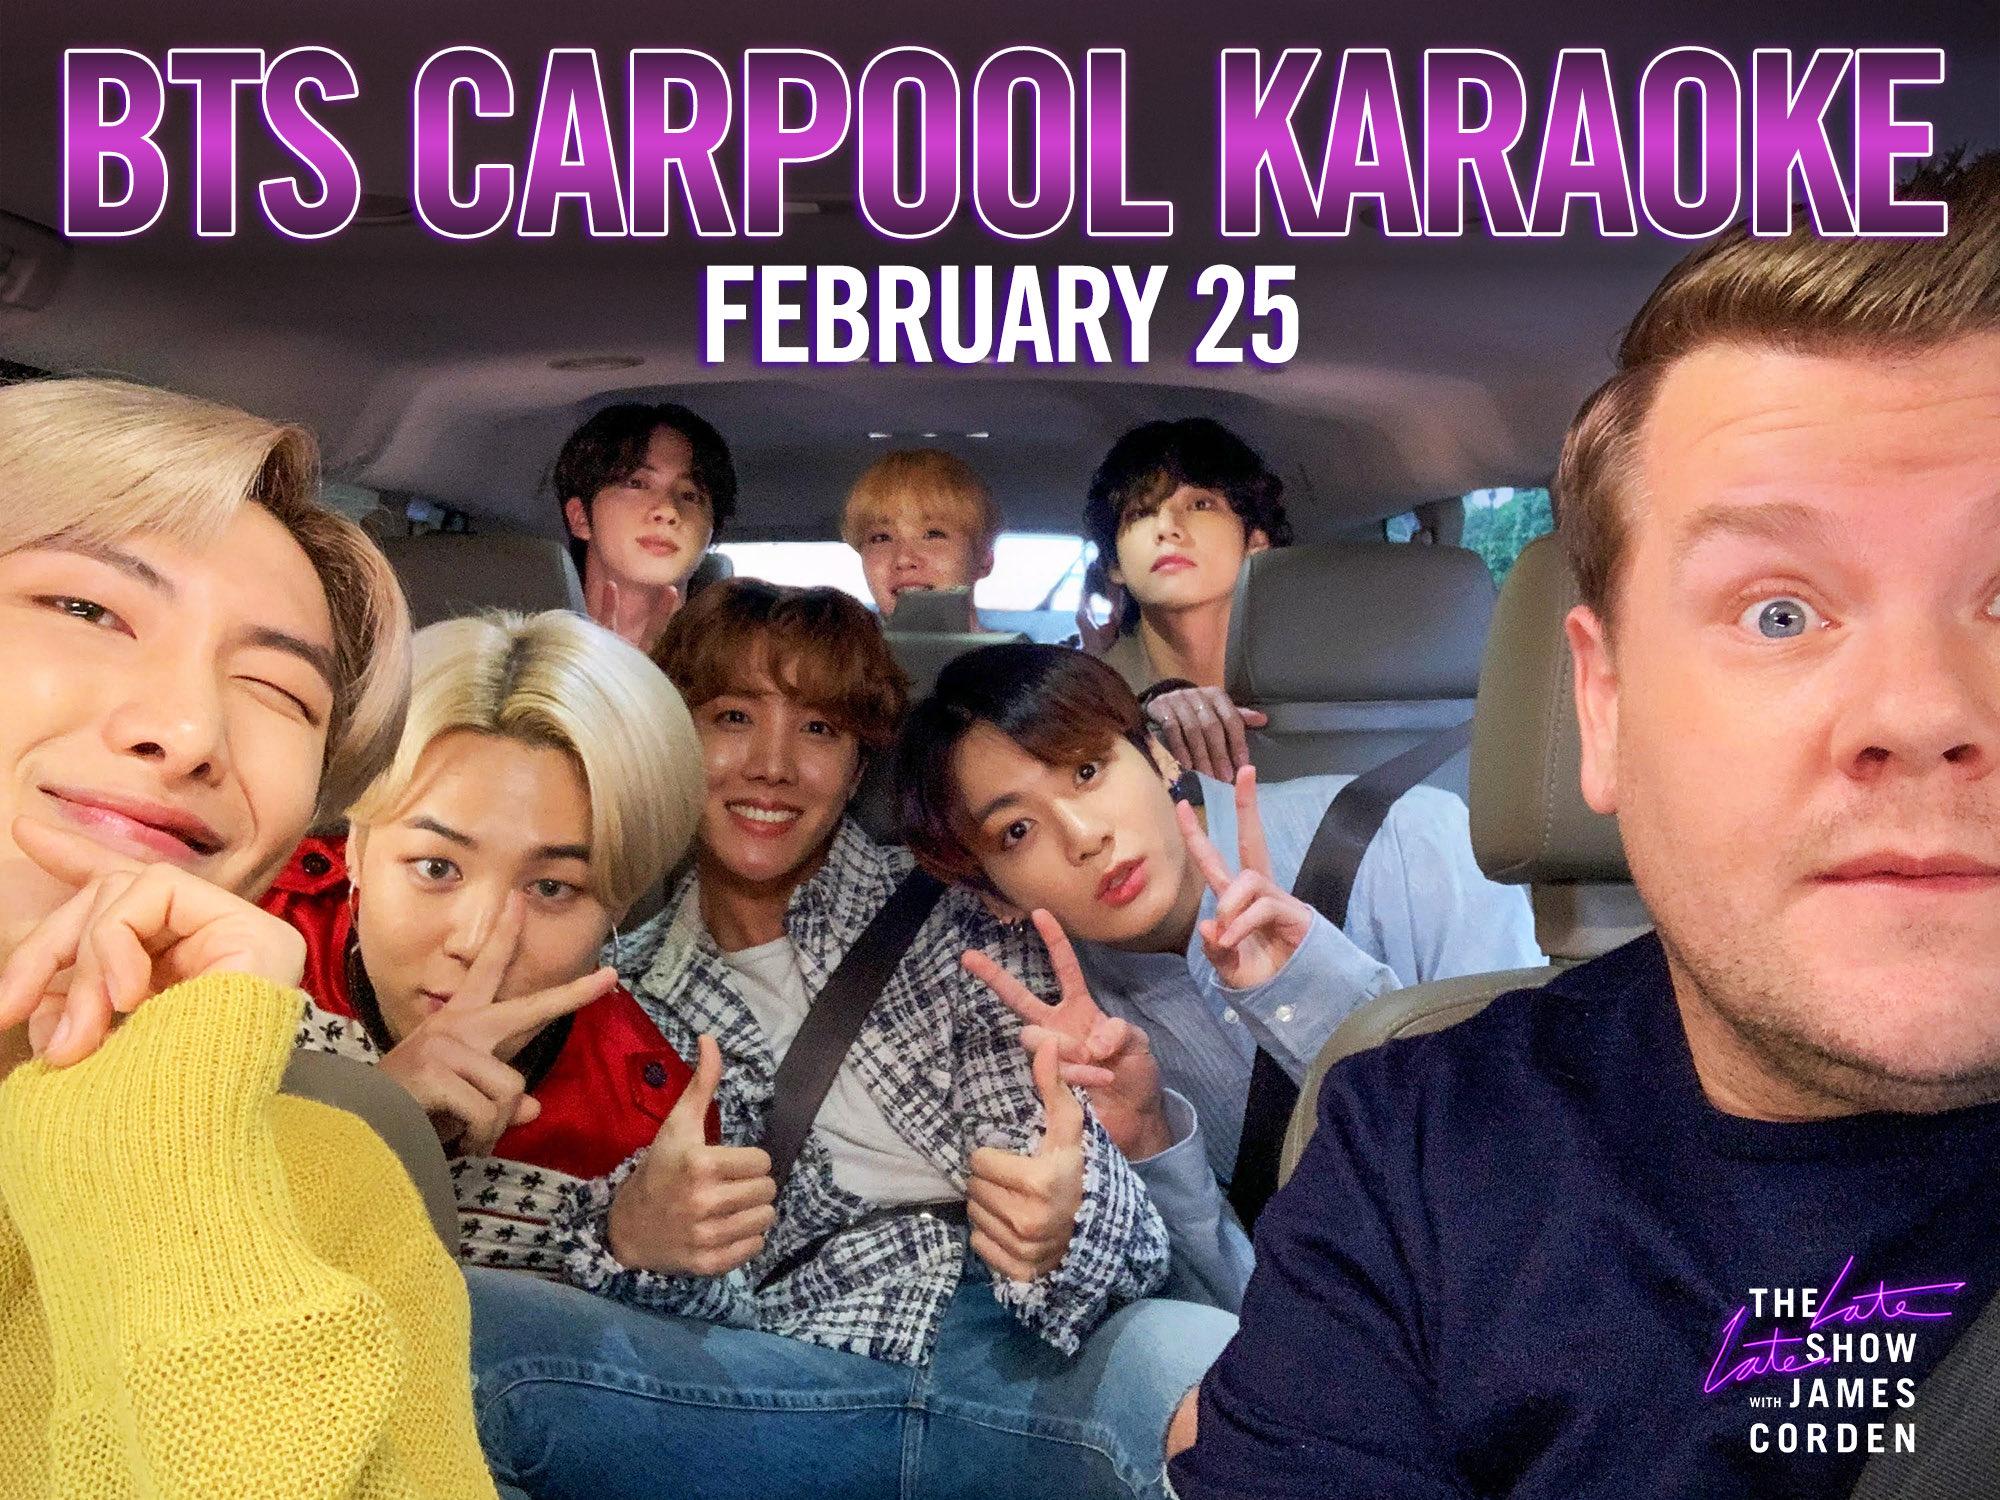 Carpool Karoake Christmas 2020 James Corden BTS is going to do Carpool Karaoke with James Corden | EW.com